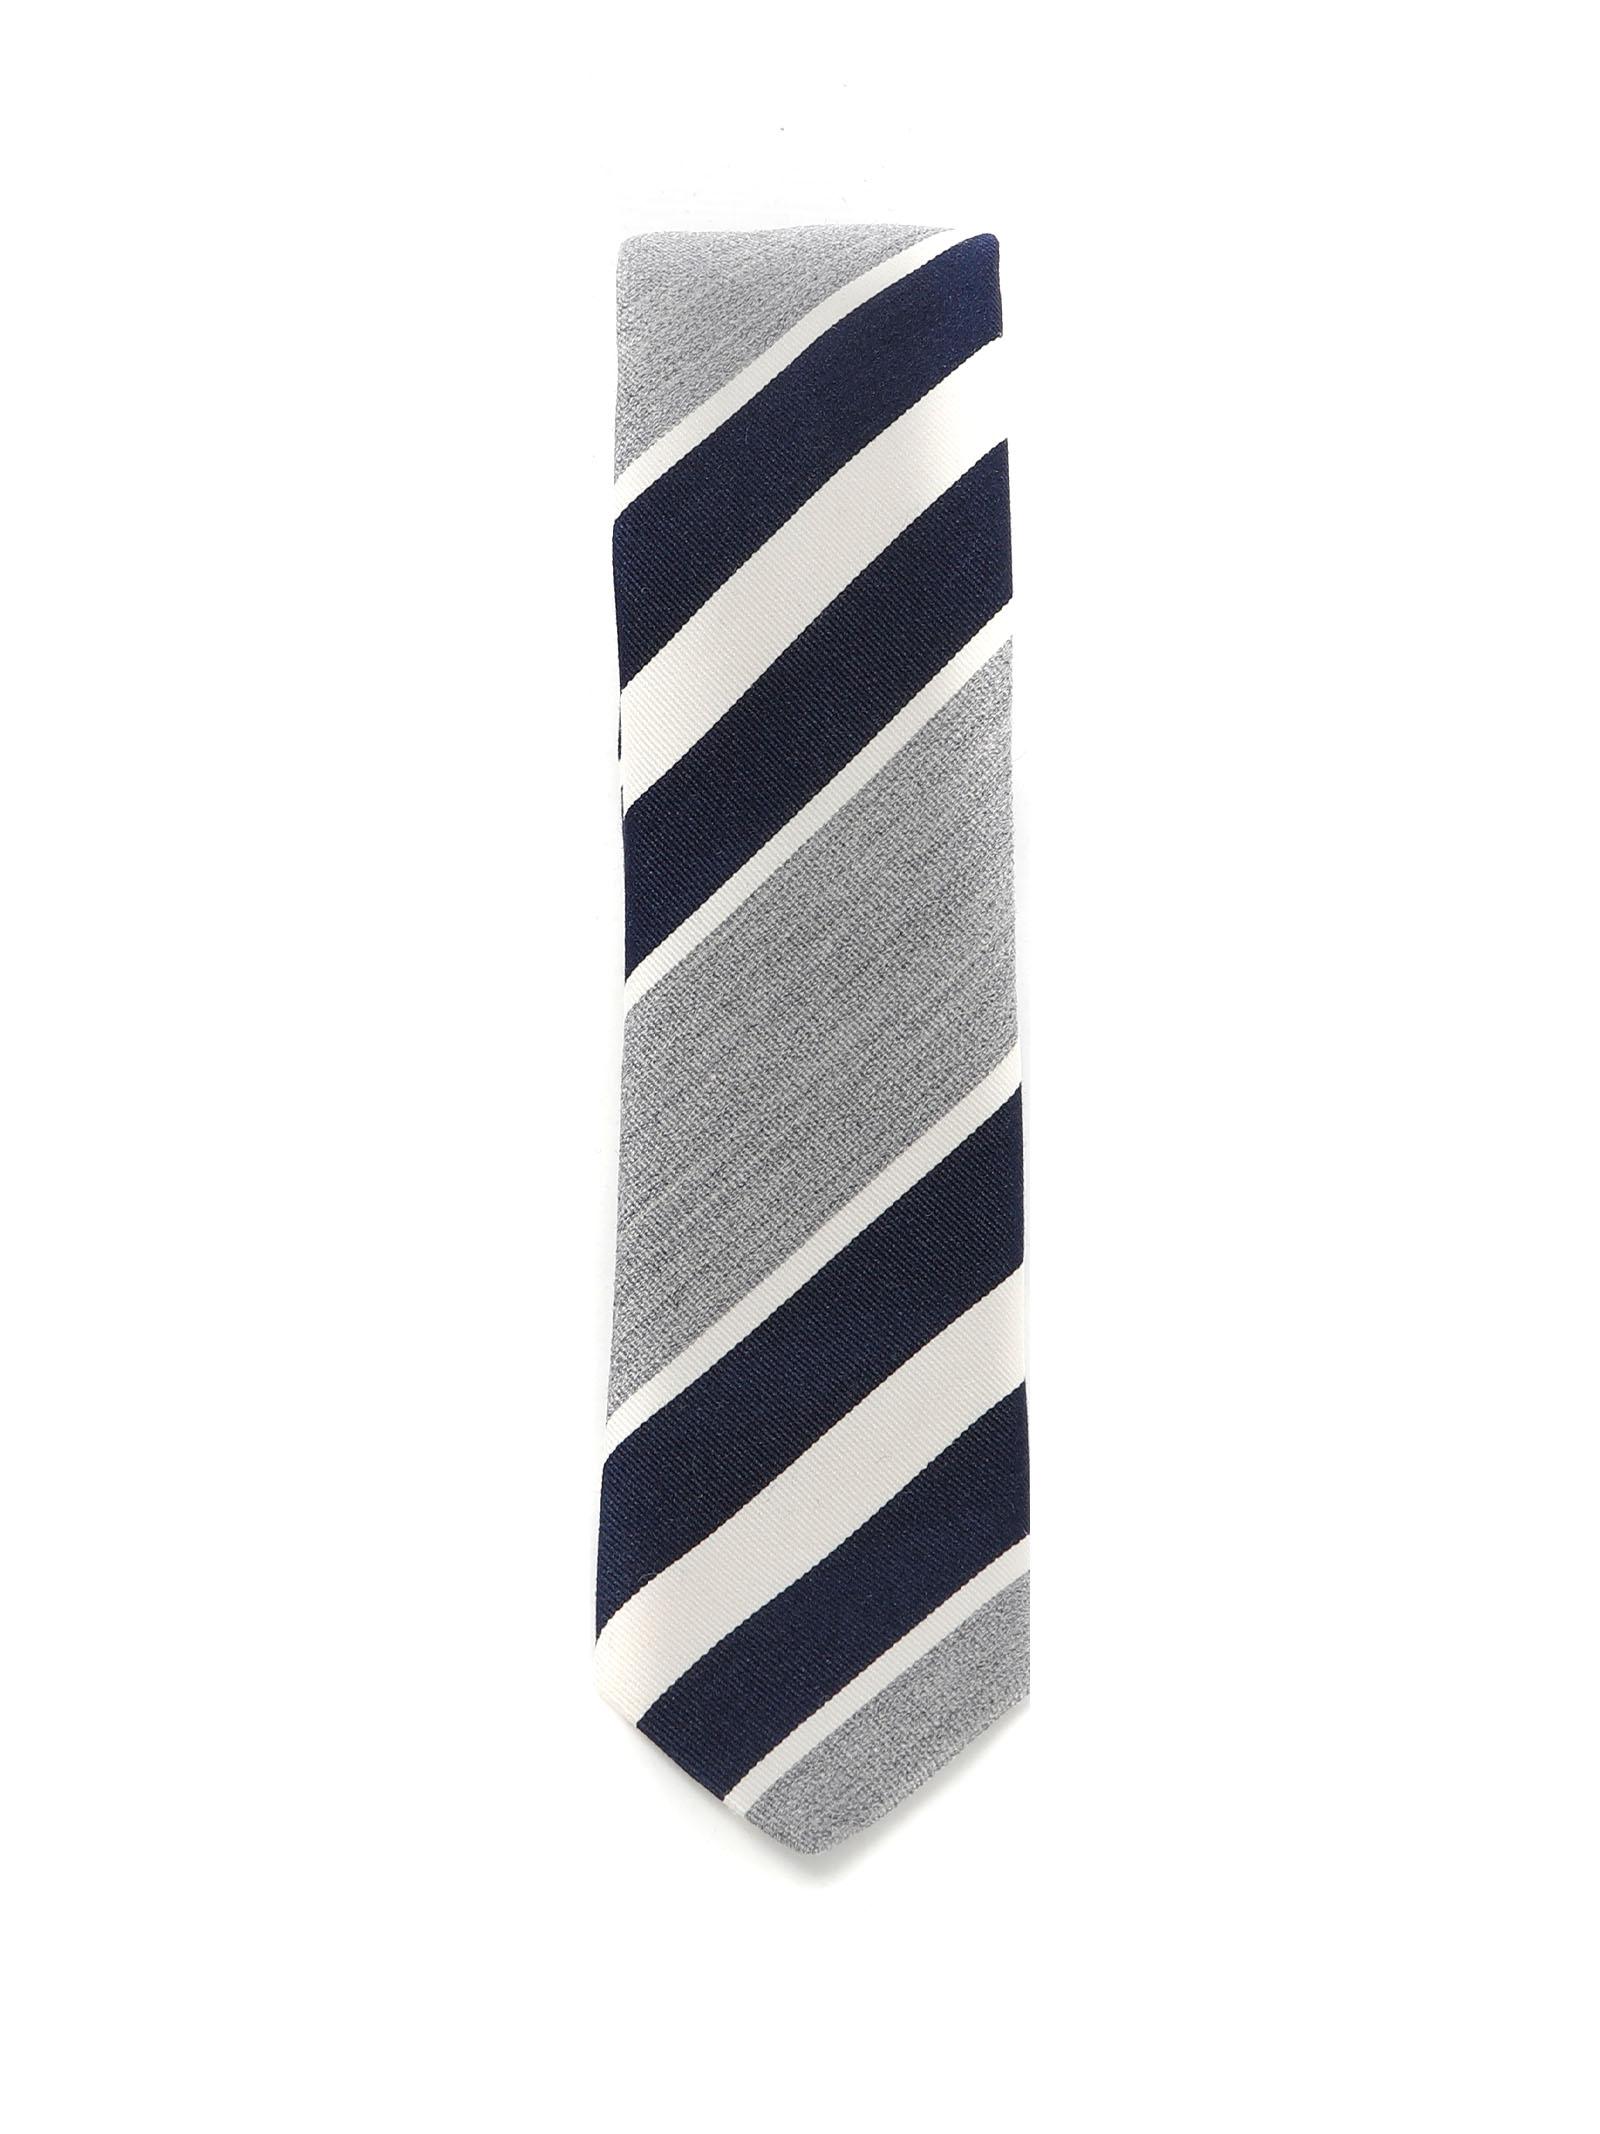 Cravatta blu navy, grigia e bianca in cotone e seta ELEVENTY | Cravatte | C77CRAA01-CRA0C03011